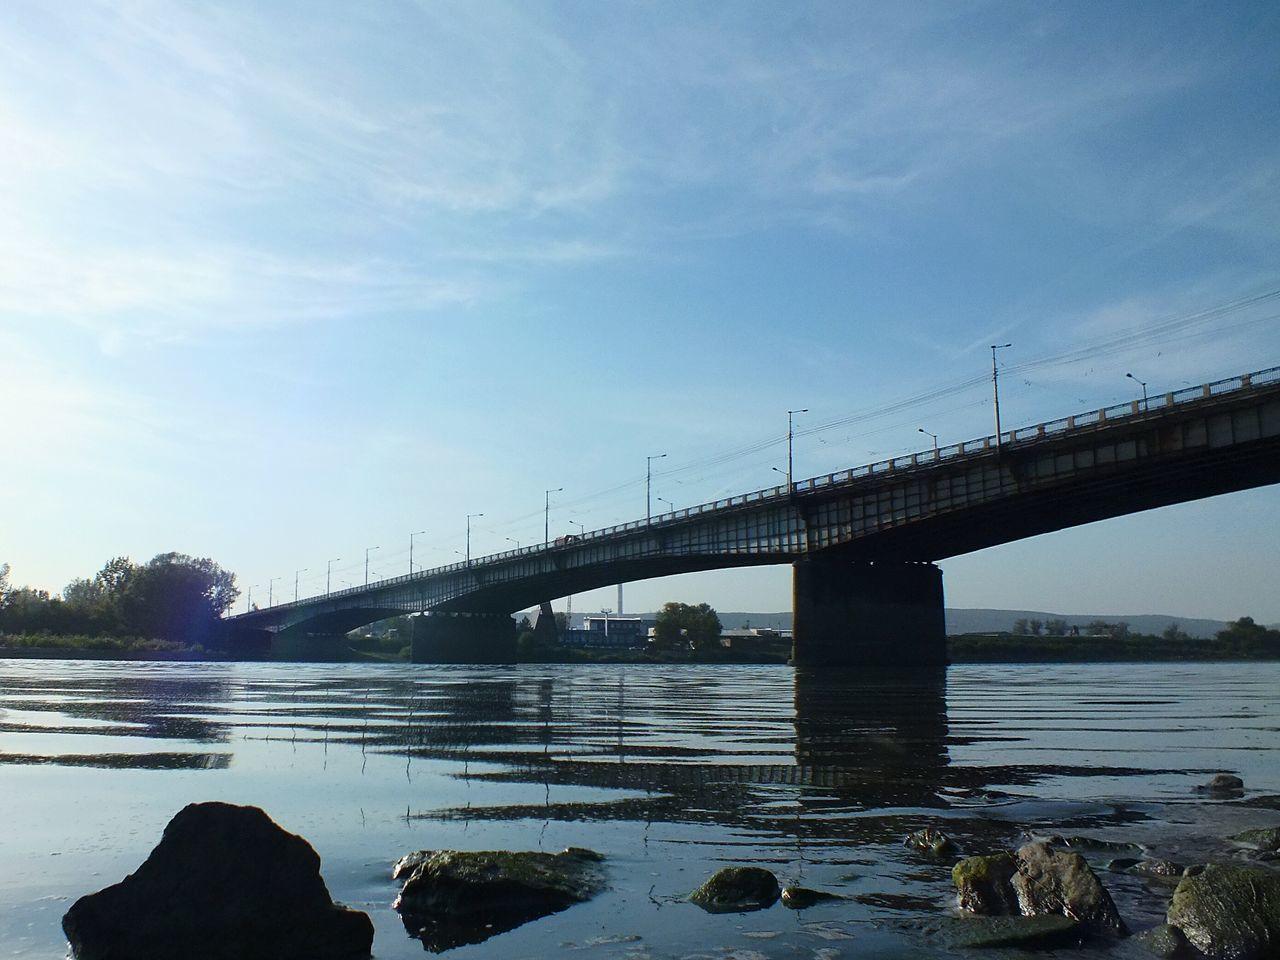 Water Landscape River река томь Siberia Russia Novokuznetsk Nature No People Relaxing Bridge Nvkz мост Rock нвкз Новокузнецк сибирь